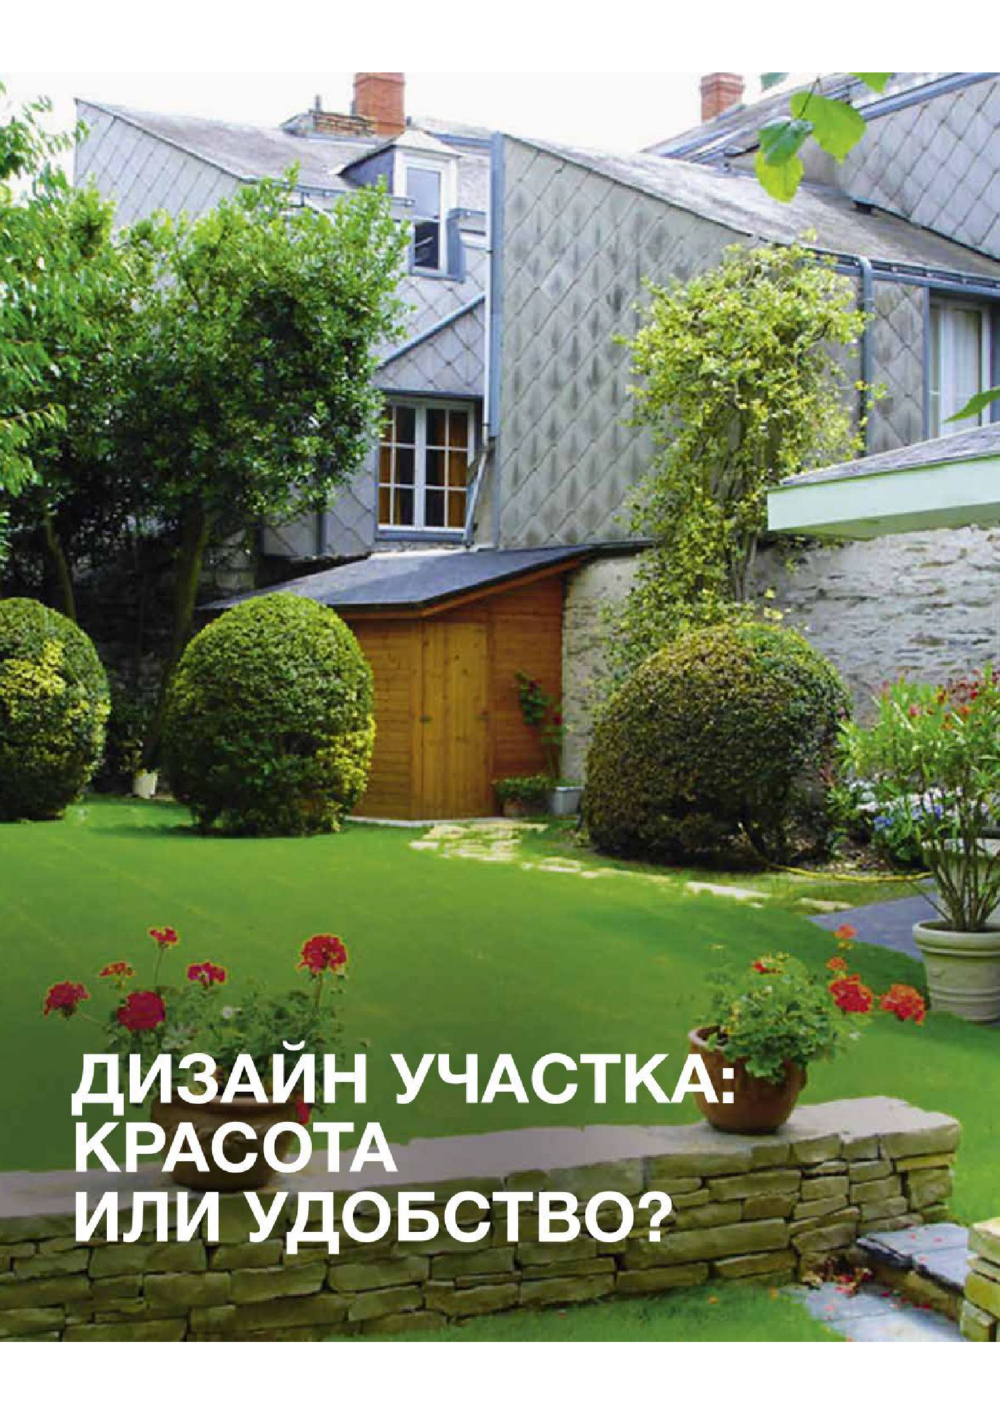 http://i2.imageban.ru/out/2014/01/18/a254a031e4b748004e79b7d7ba803c14.jpg